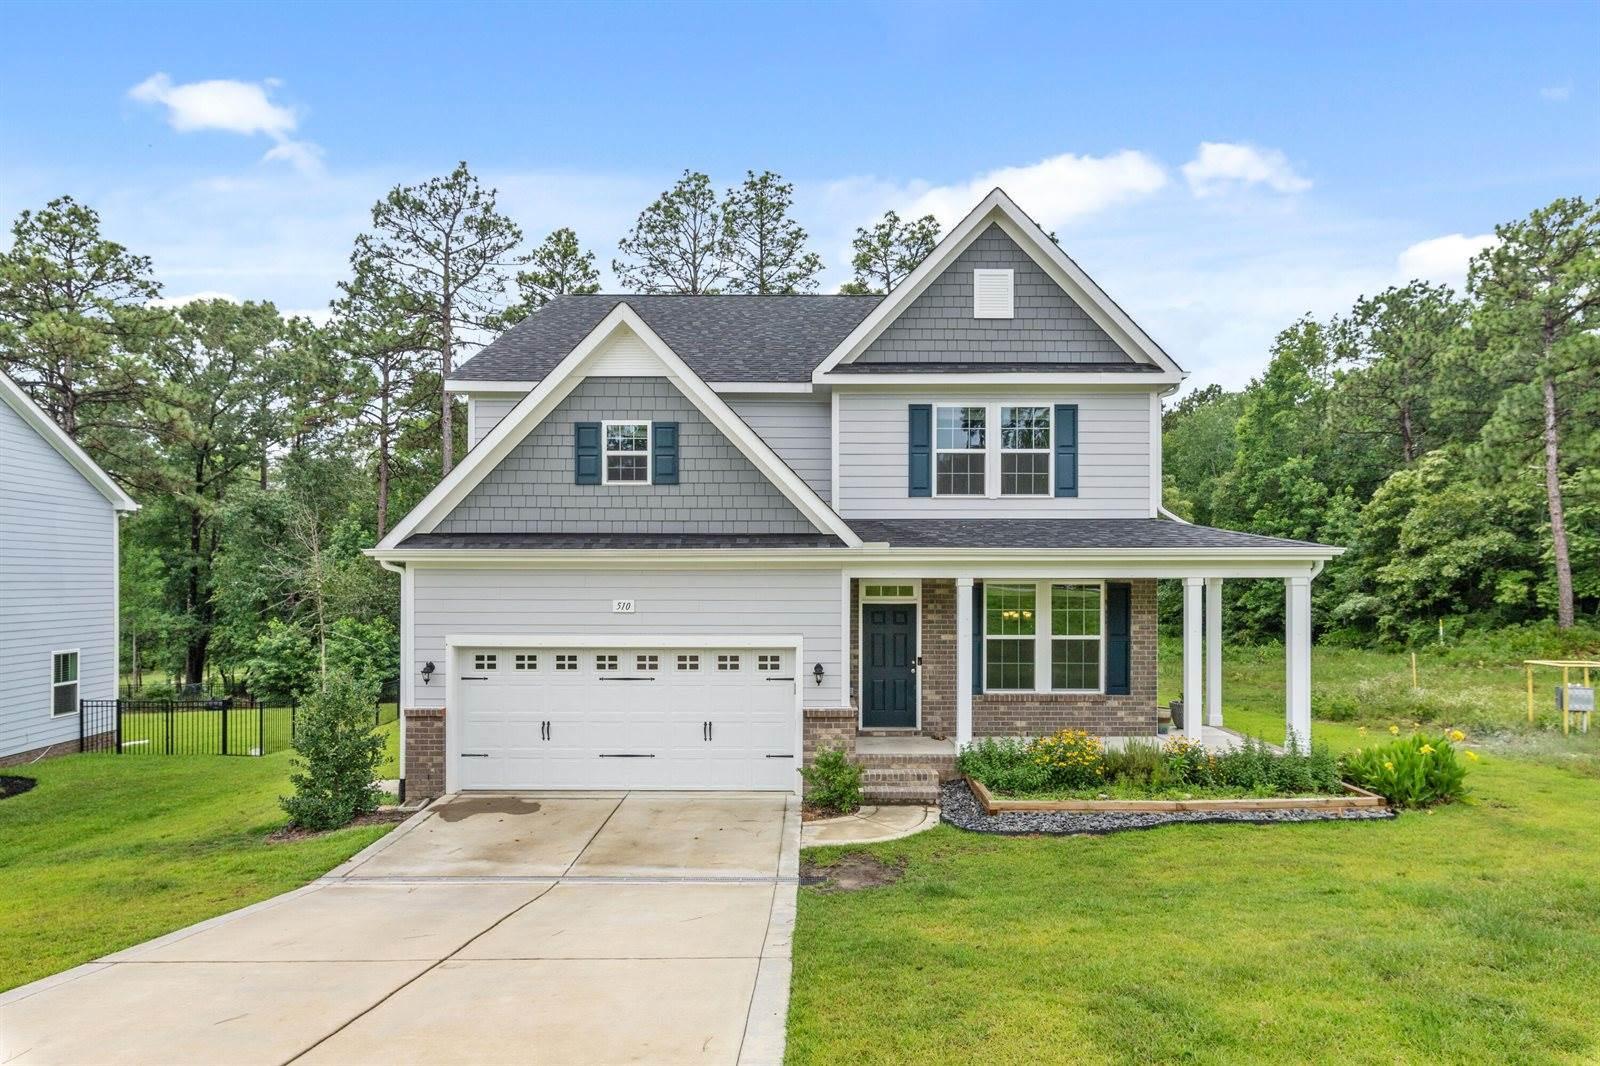 510 Avenue Of The Carolinas, Carthage, NC 28327